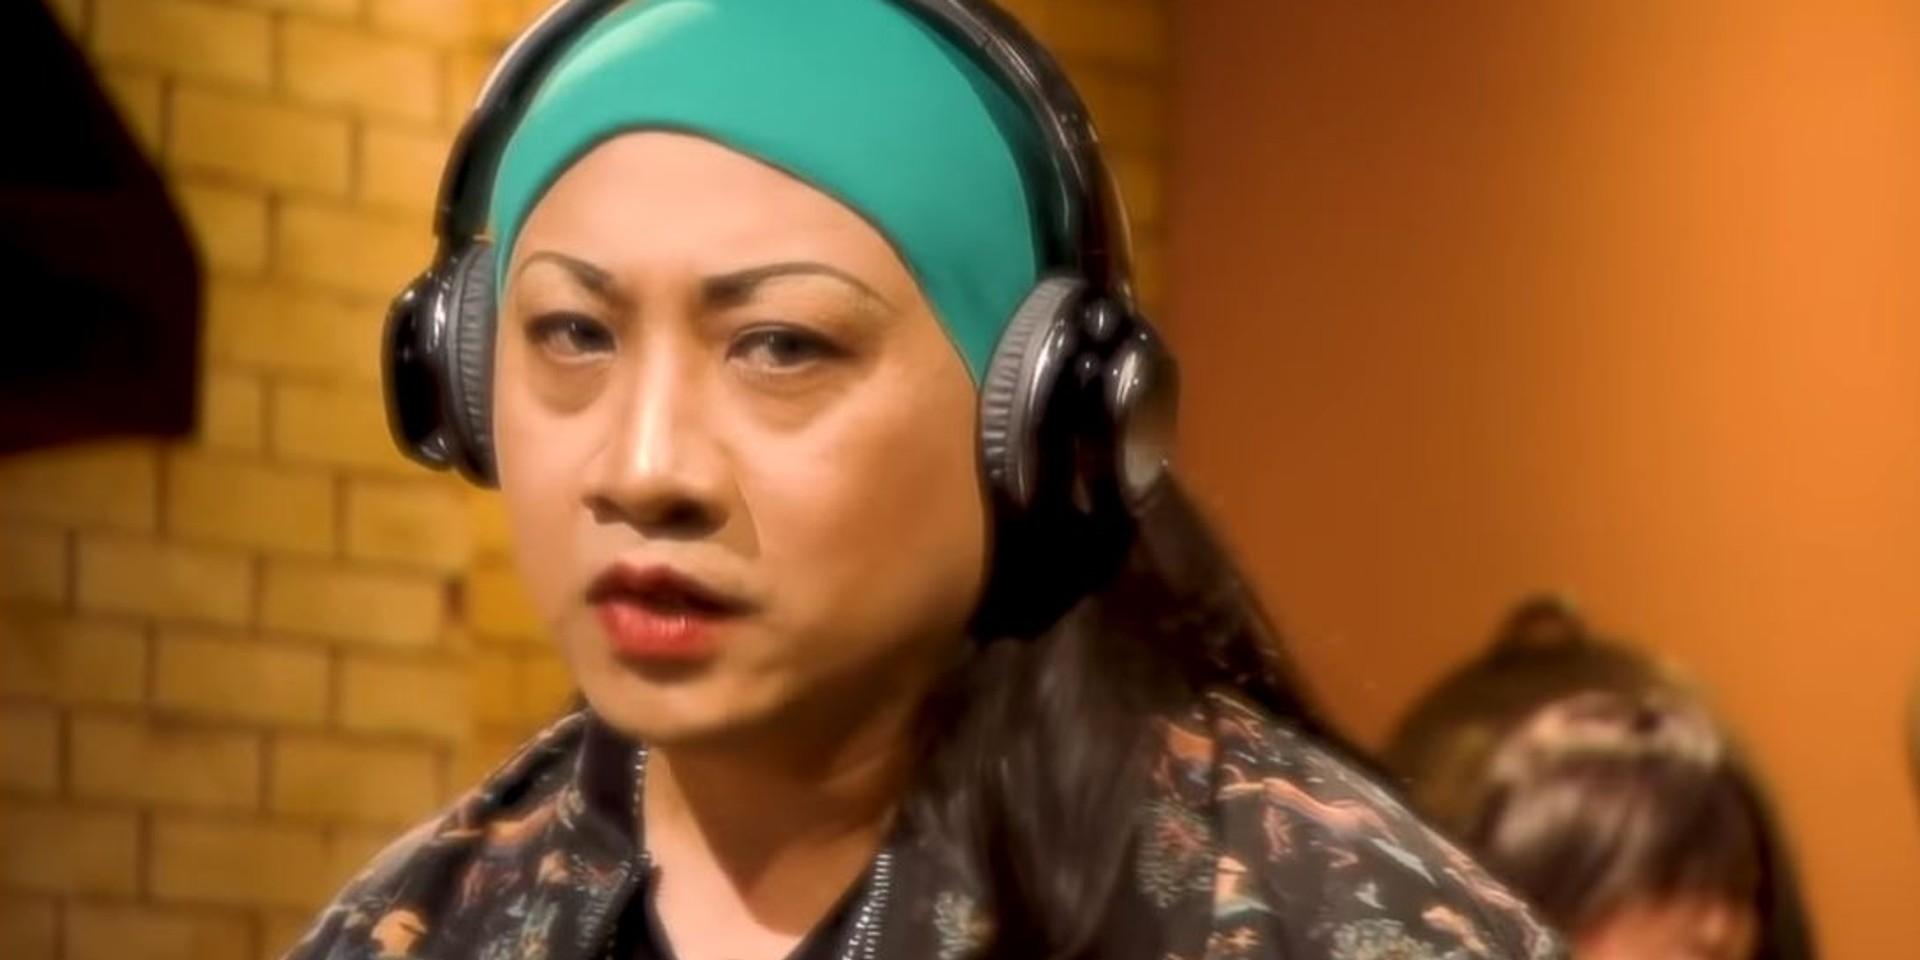 UDD react to Michael V's 'Oo' parody on Bubble Gang